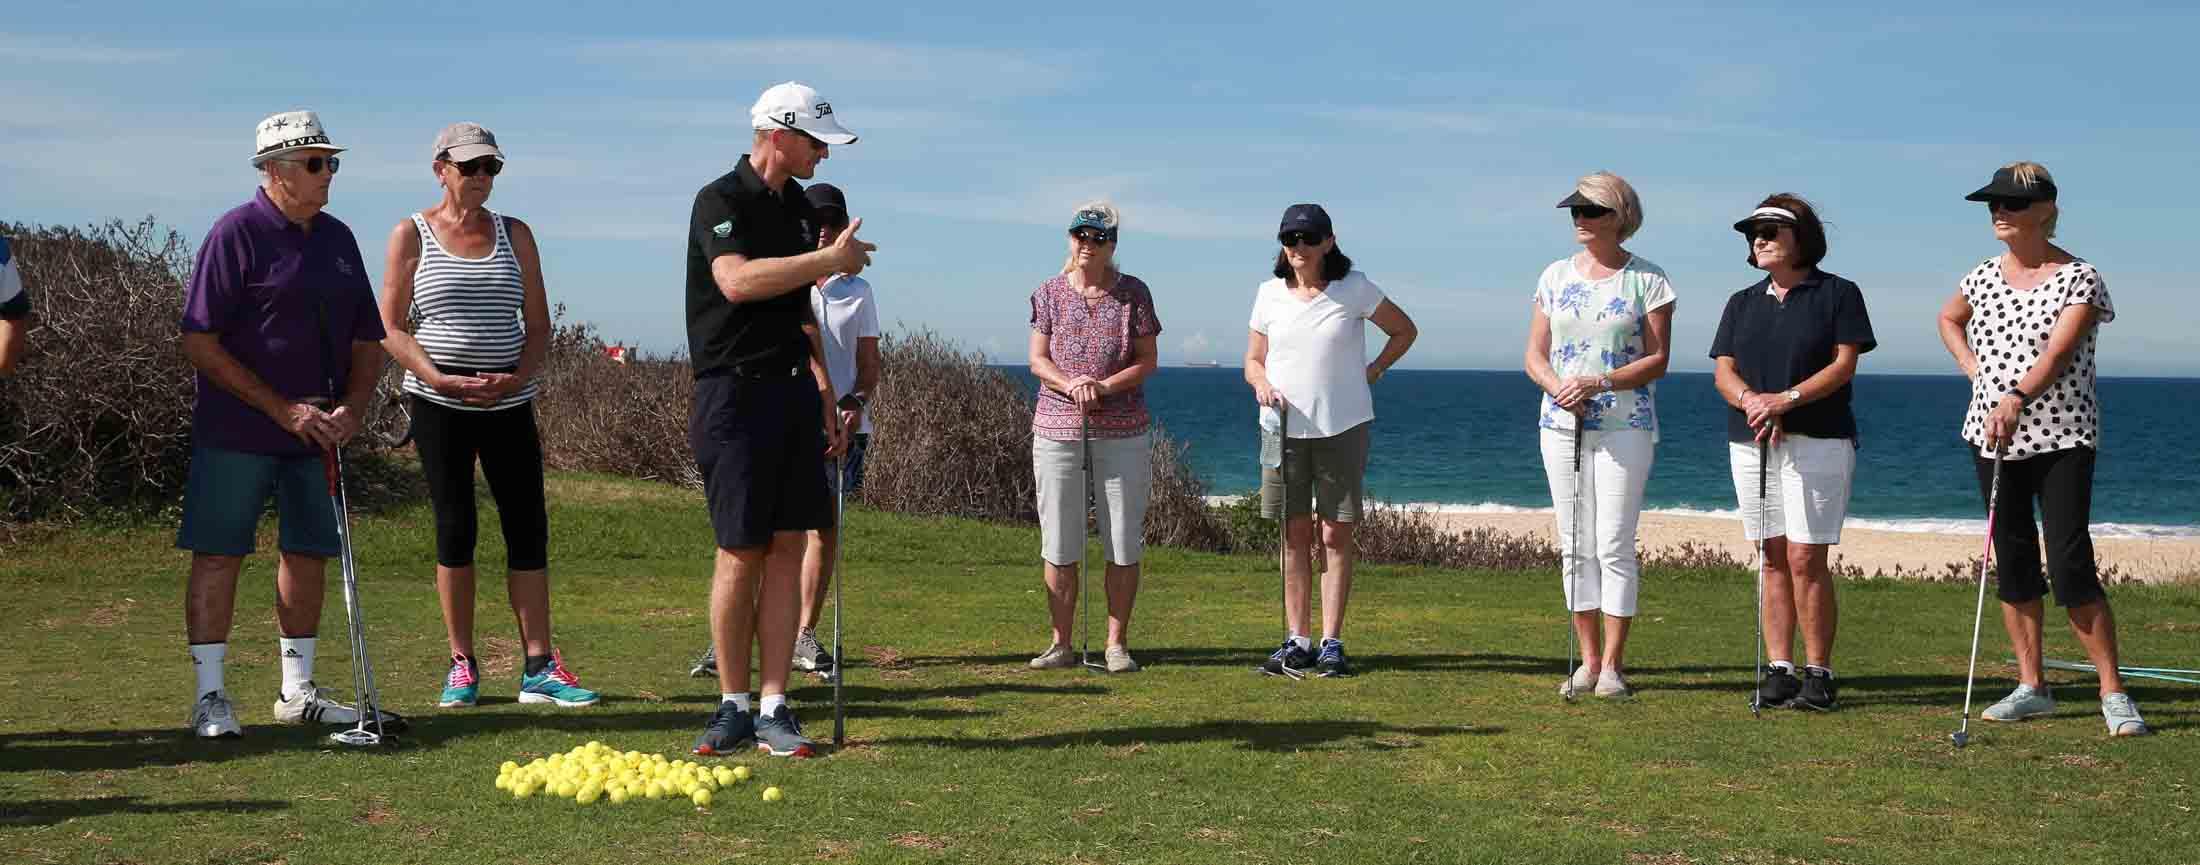 Get into golf for seniors